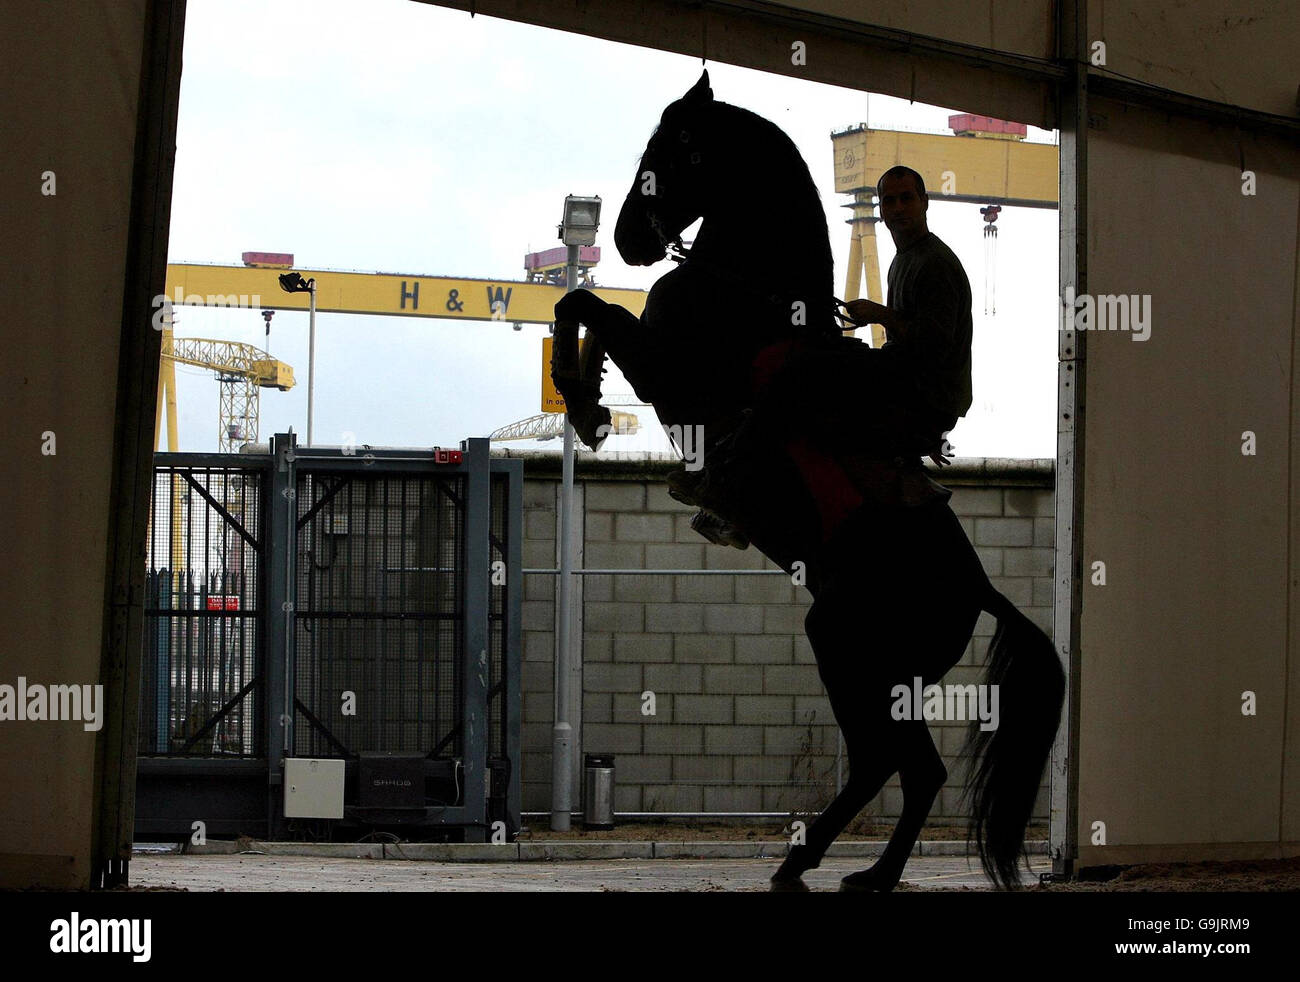 Rehearsal ahead of Northern Ireland International Horse Show - Stock Image